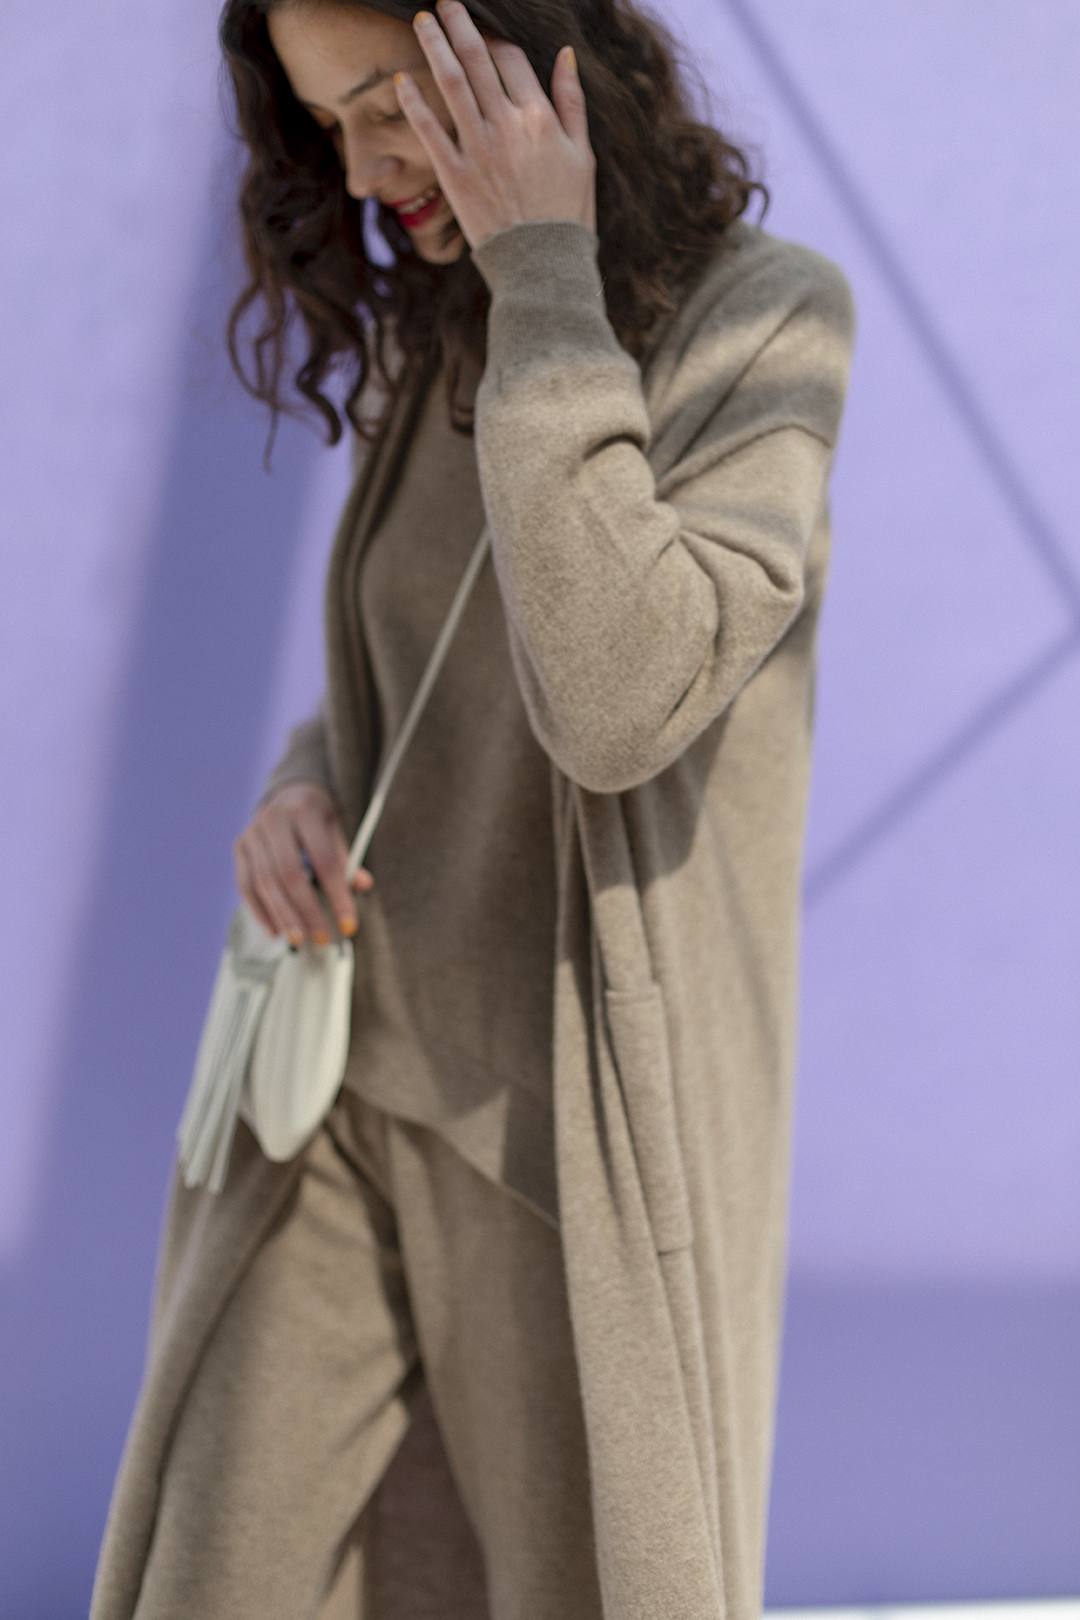 31_1 cardigan¥61,600  knit¥67,100  pants¥64,900  bag¥17,490